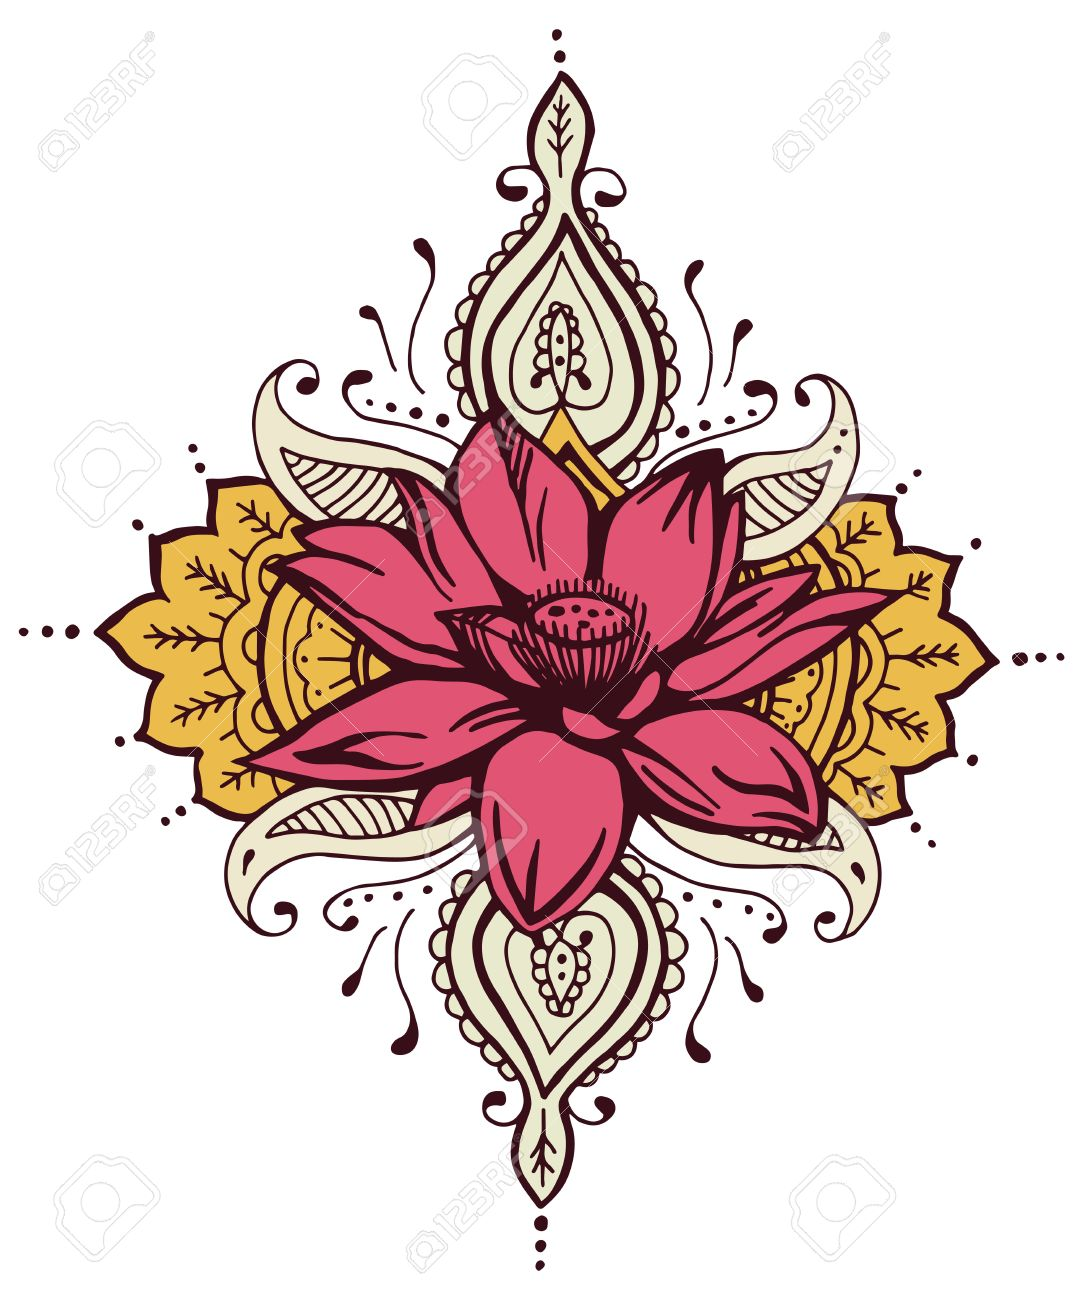 Paisley lotus flower henna design abstract henna royalty free paisley lotus flower henna design abstract henna stock vector 48582376 izmirmasajfo